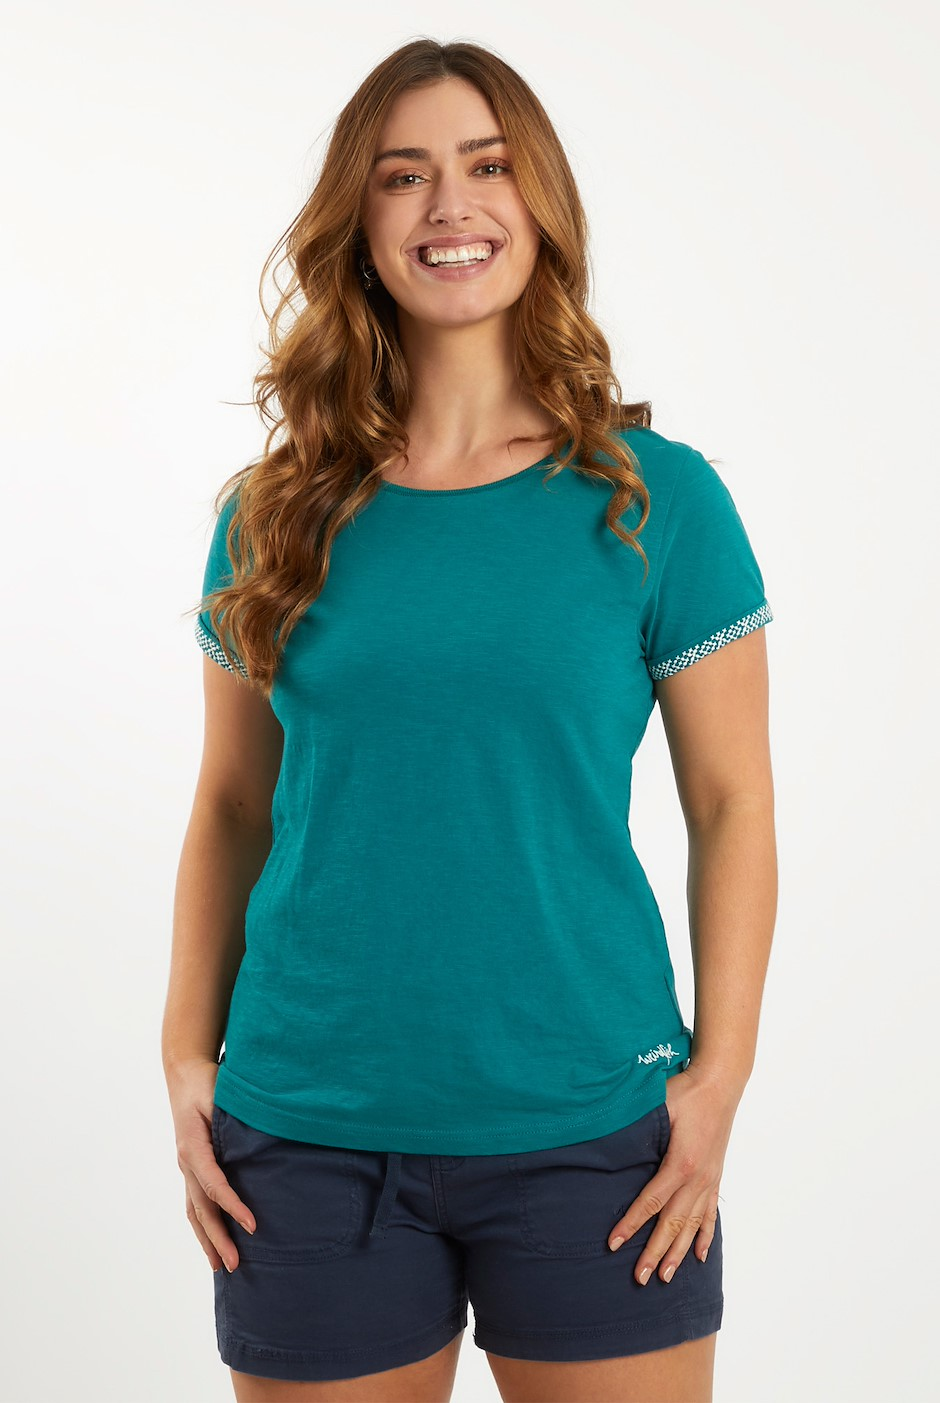 Trinity Cotton Short Sleeve T-Shirt Deep Teal